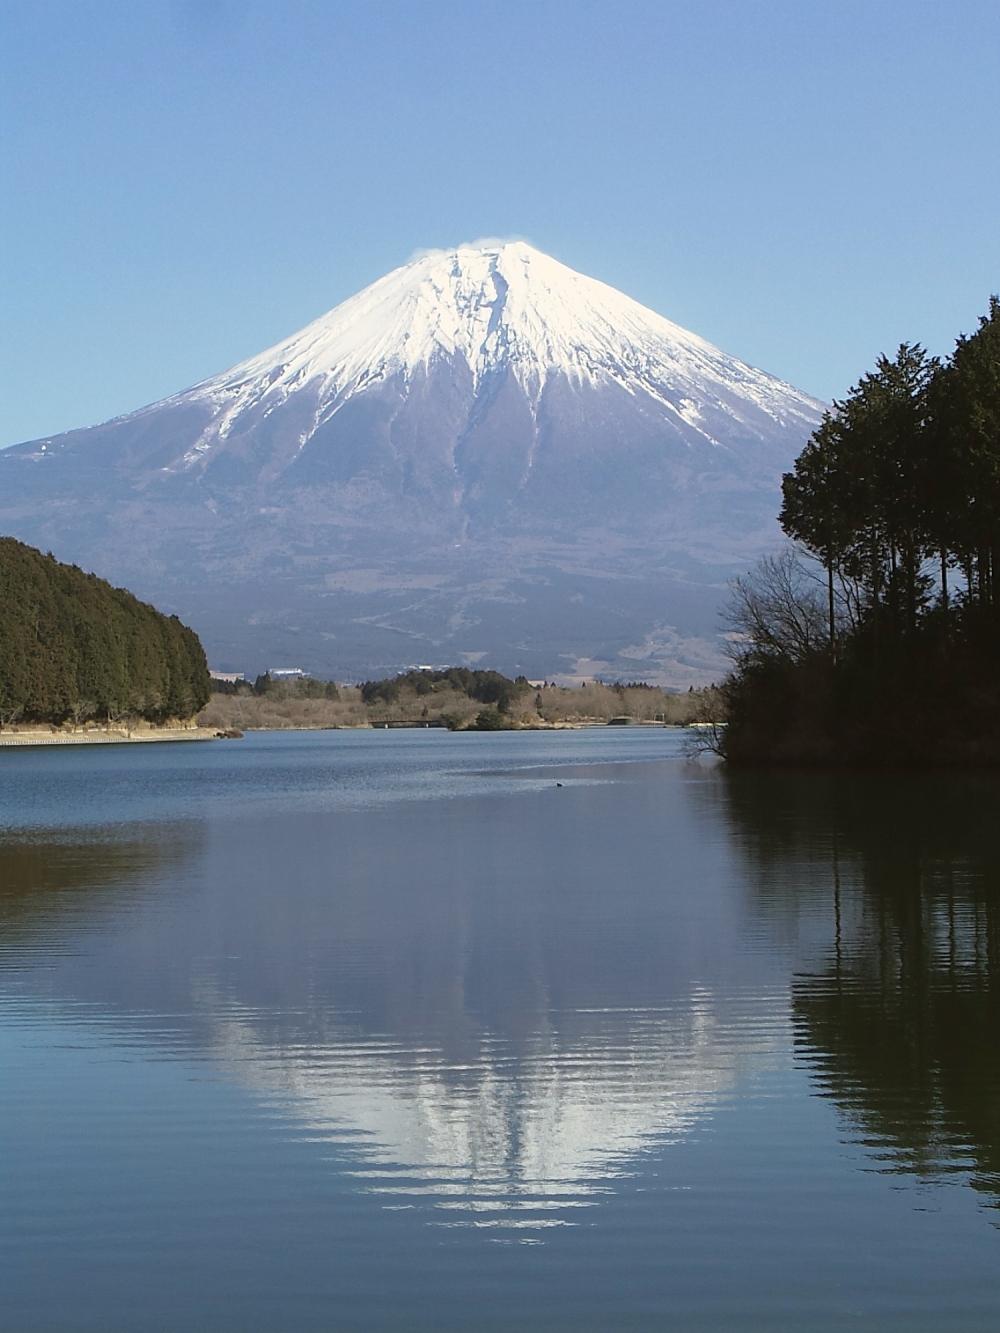 Fuji se reflétant sur le lac Tanuki, préfecture de Shizuoka, Japon